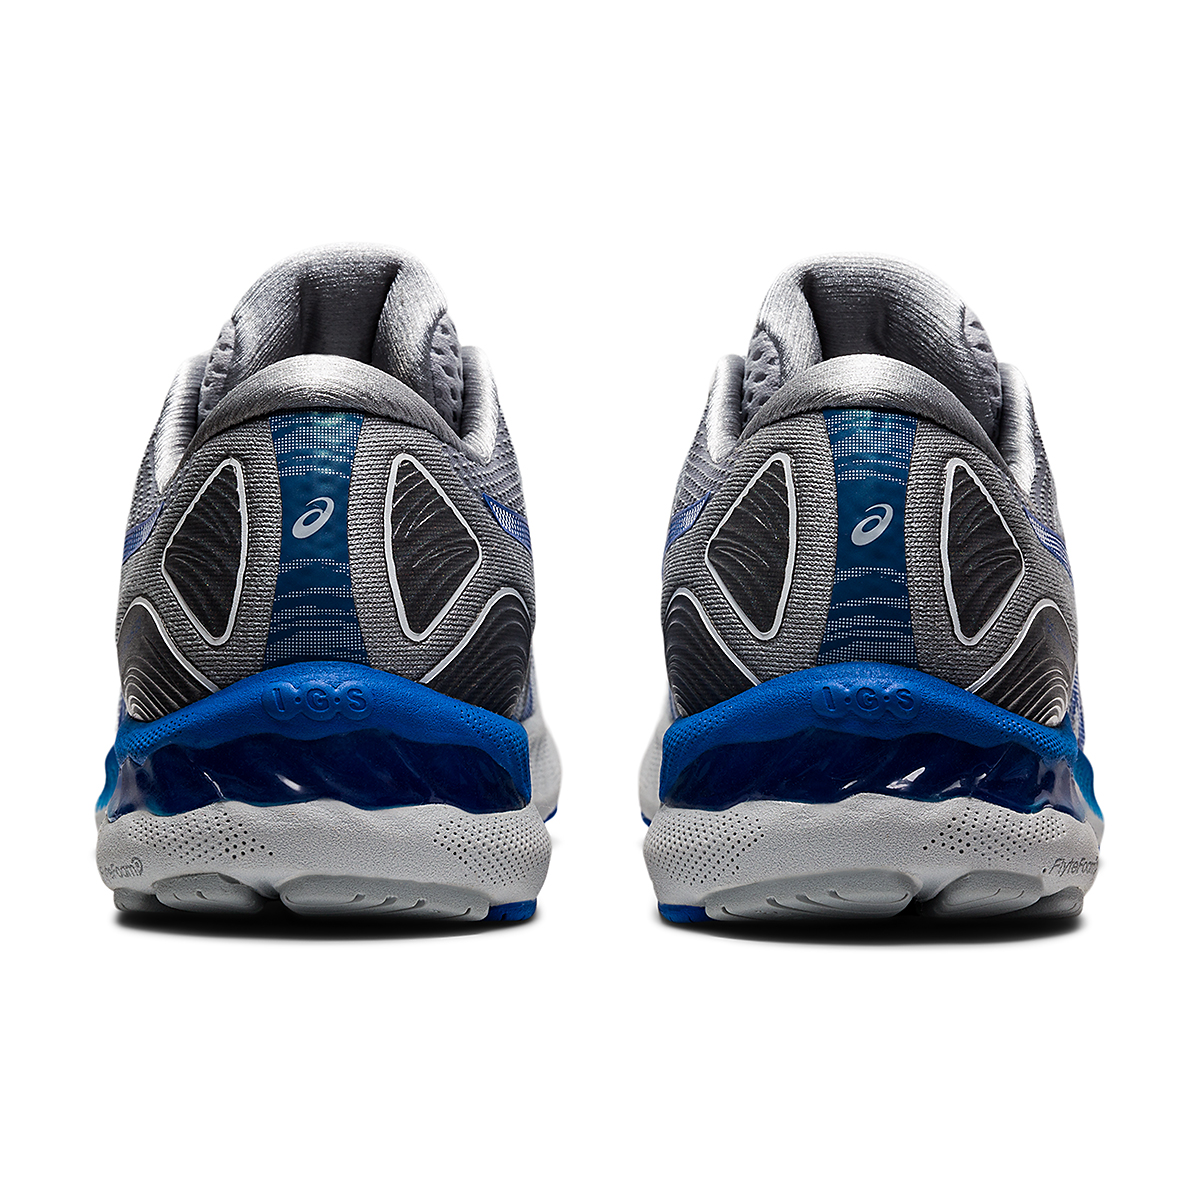 Men's Asics Gel-Nimbus 23 Running Shoe - Color: Piedmont Grey - Size: 6 - Width: Regular, Piedmont Grey, large, image 7